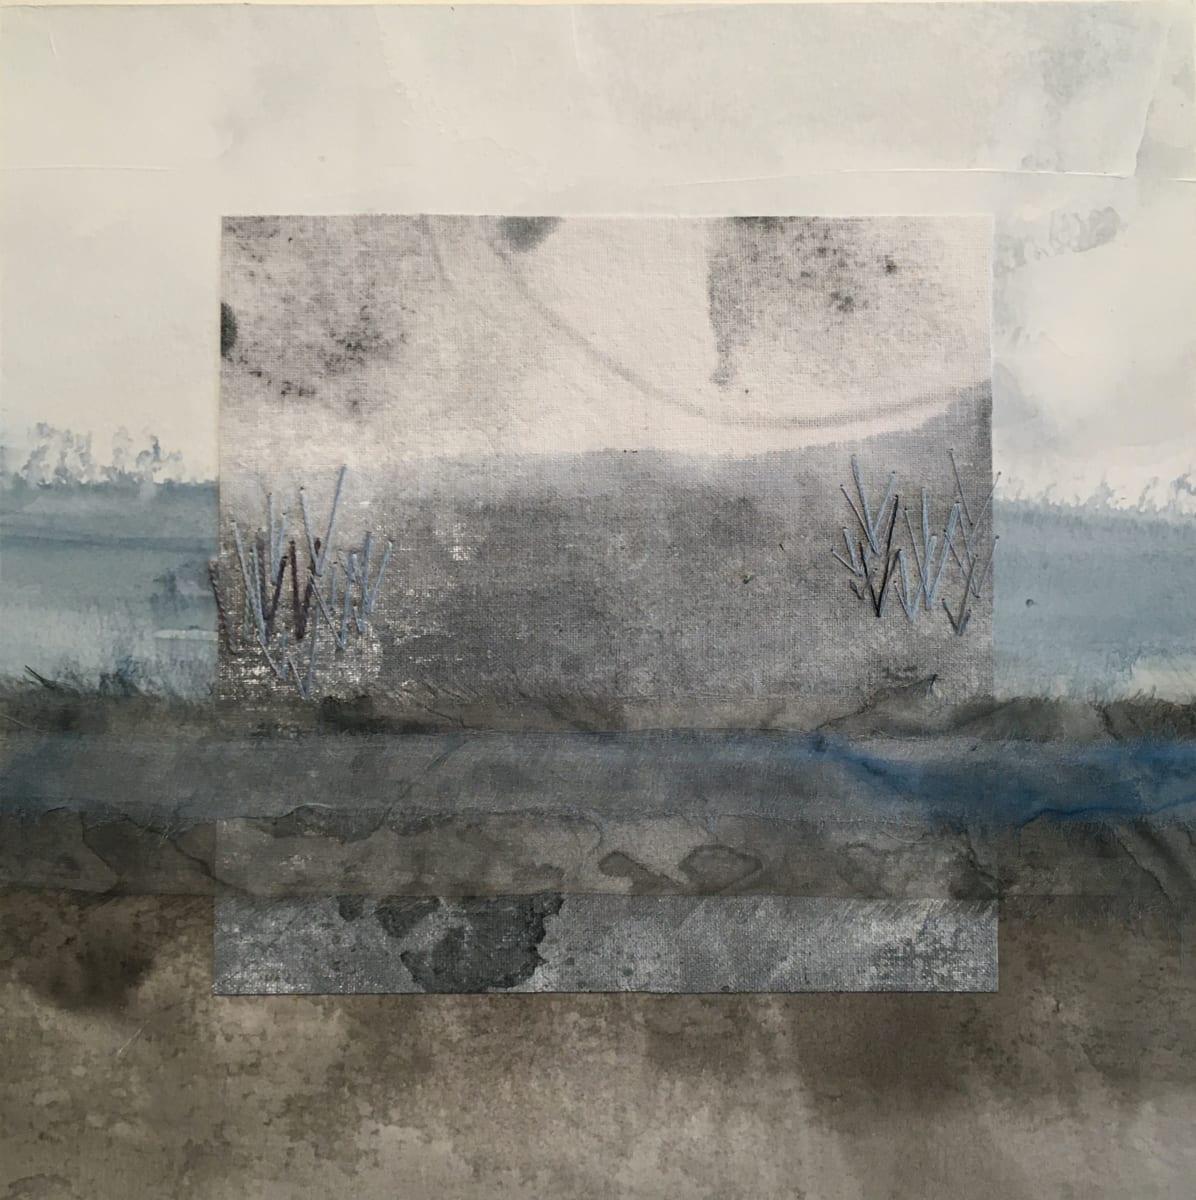 Morning at Hope Bay by Susan Purney Mark